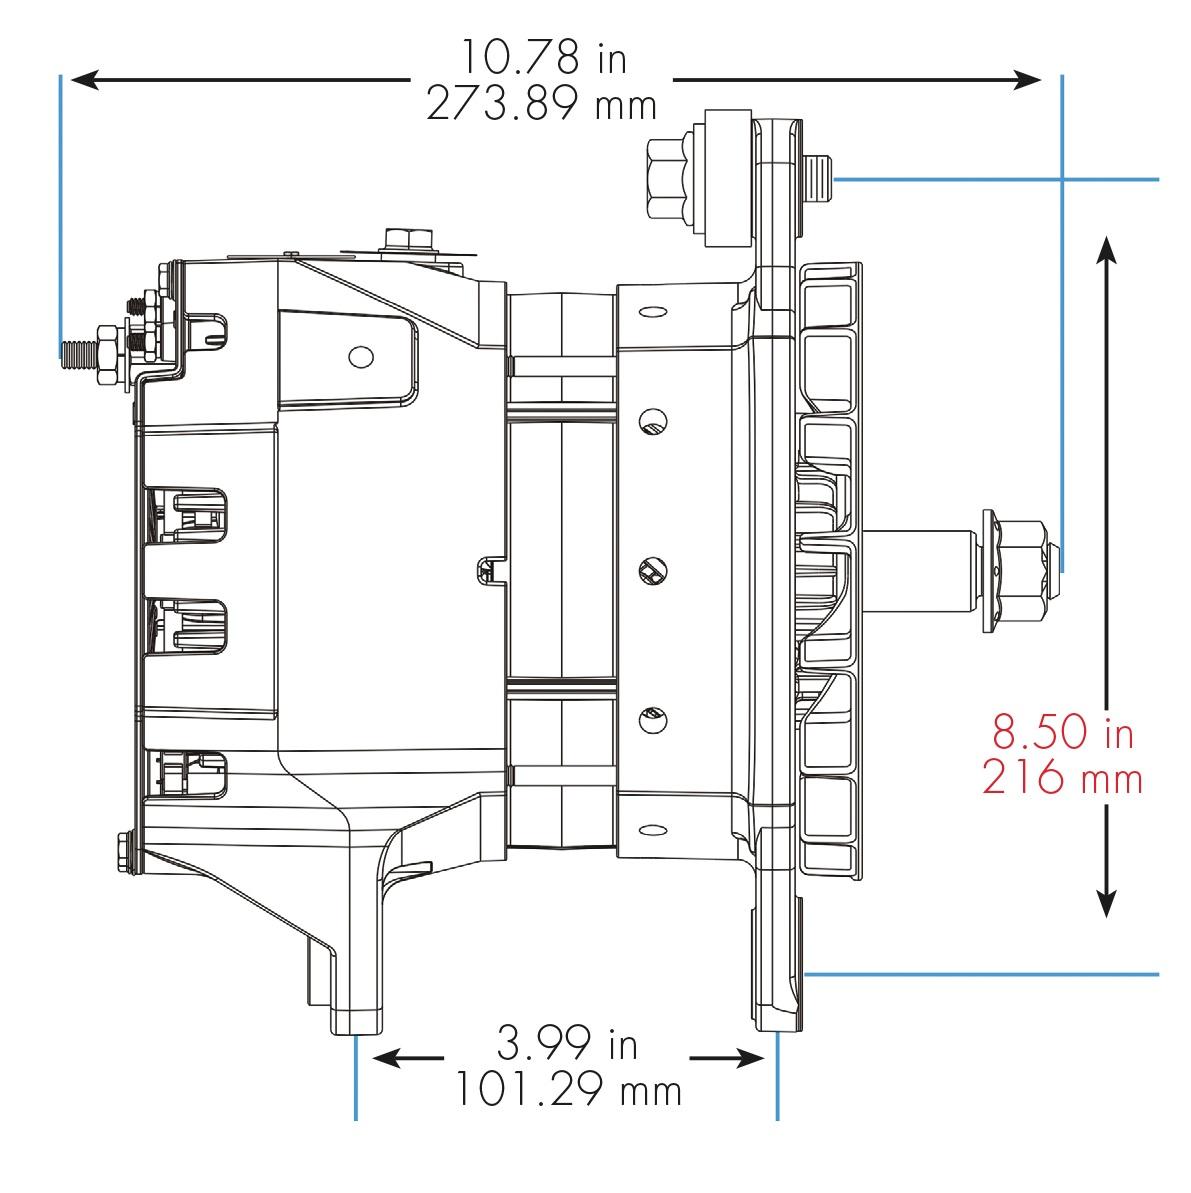 medium resolution of two wire acdelco alternator wiring schematic chevy 4 wire delco alternator farmall 706 wiring diagram